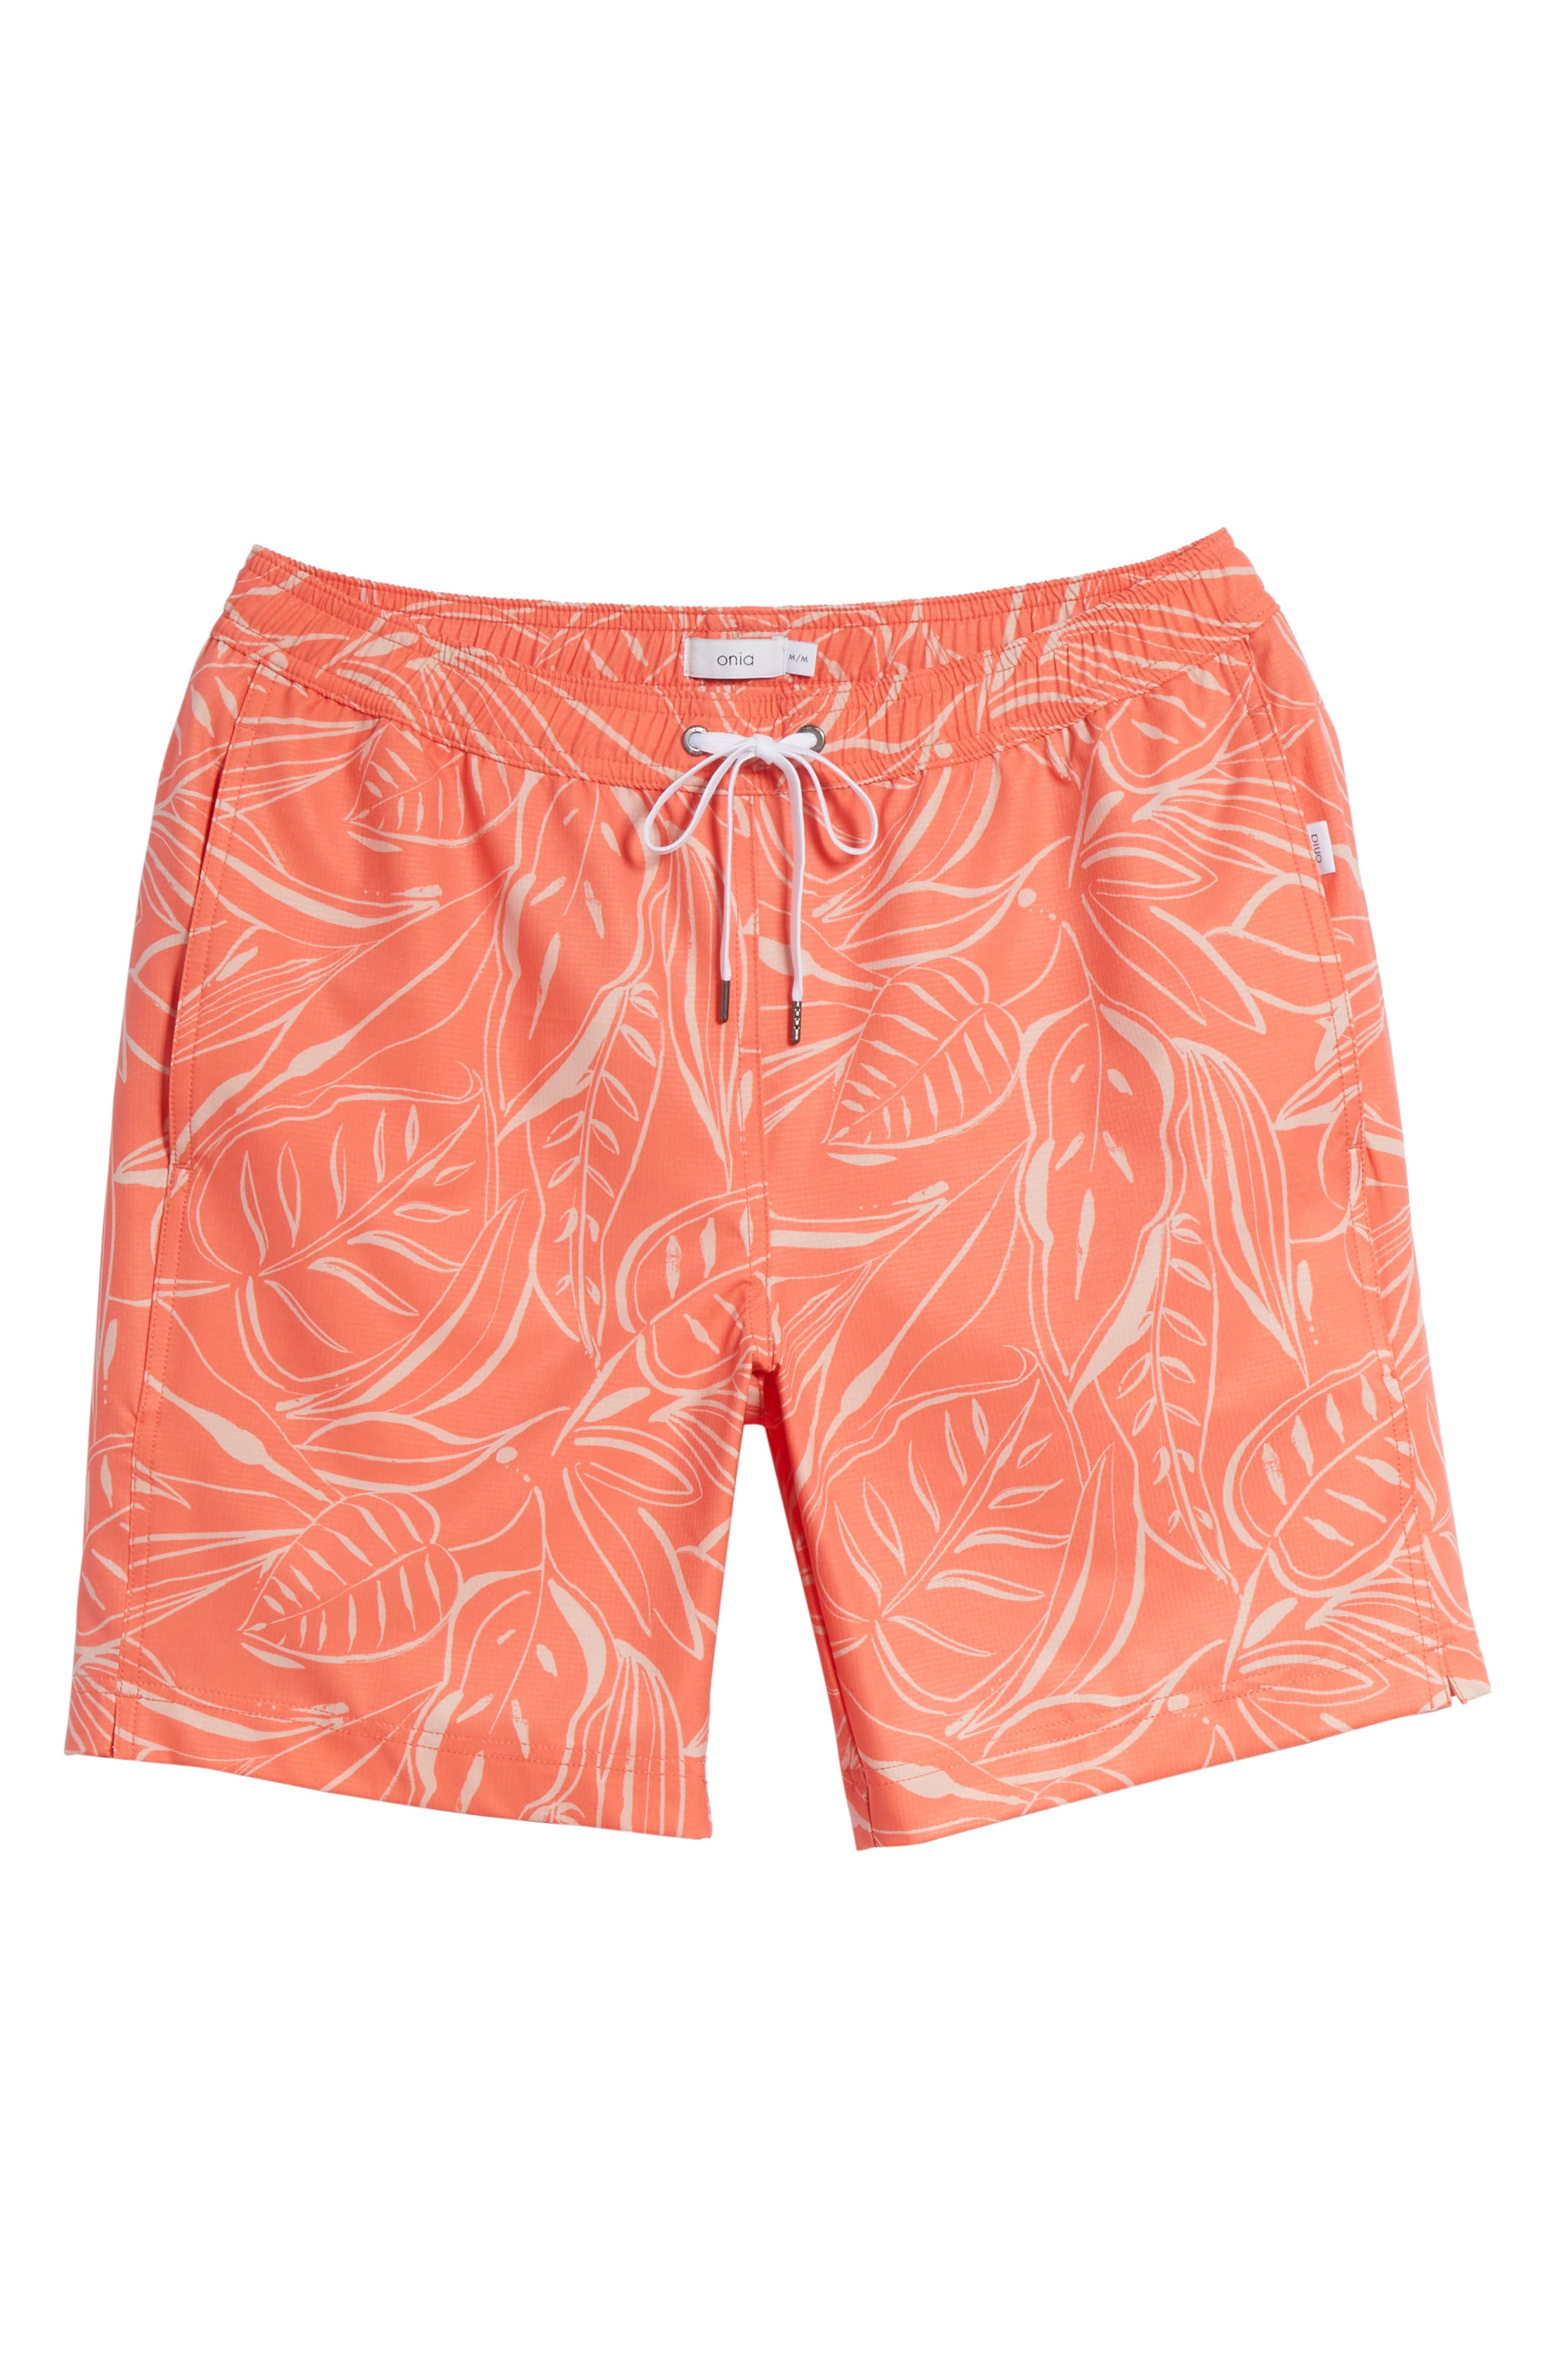 Charles Leaf Print Swim Trunks,                             Alternate thumbnail 6, color,                             Tangerine Coral